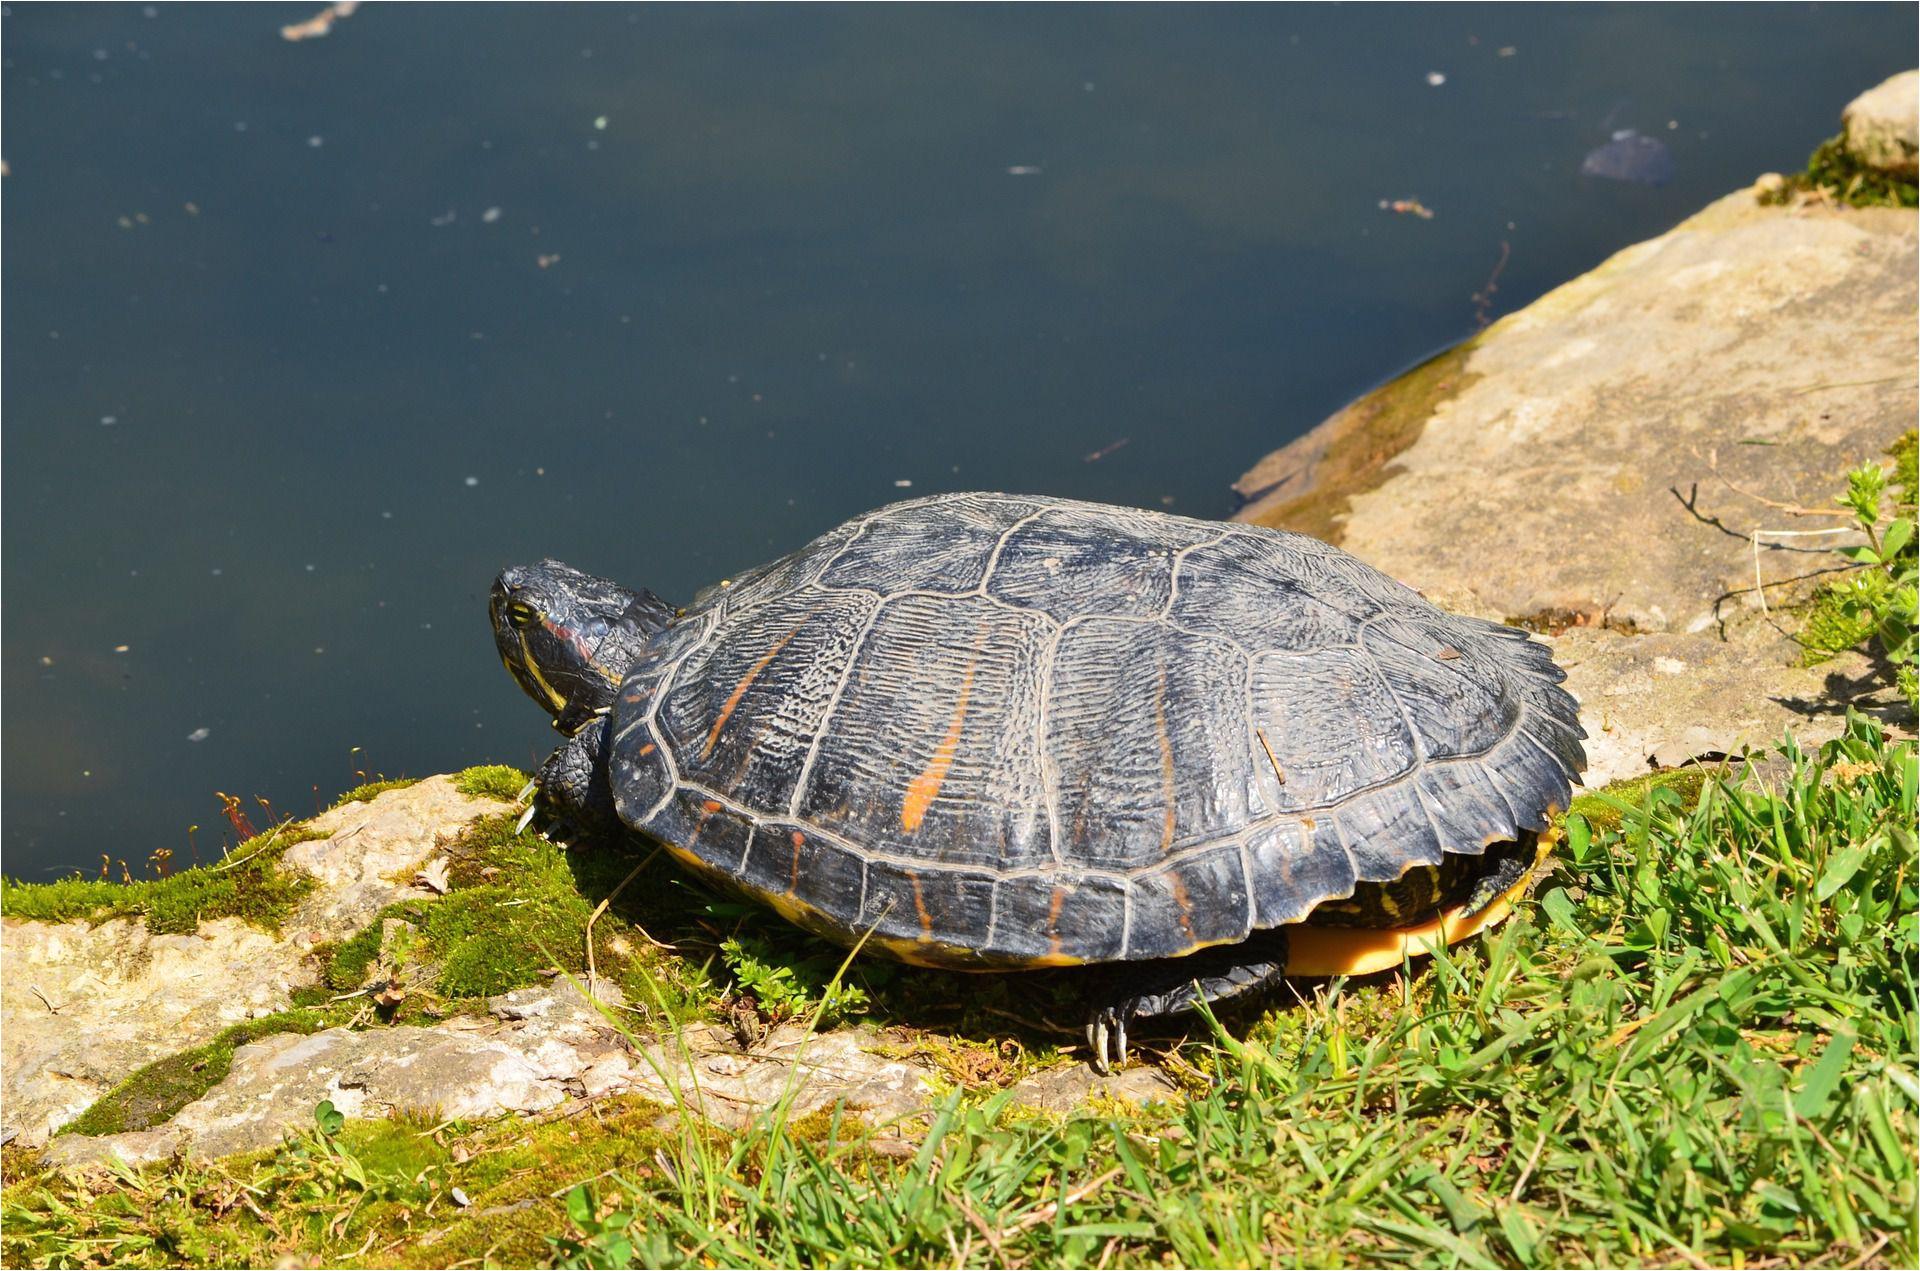 basking red eared turtle 1488378 1920 5934e53e3df78c08abe2893c jpg